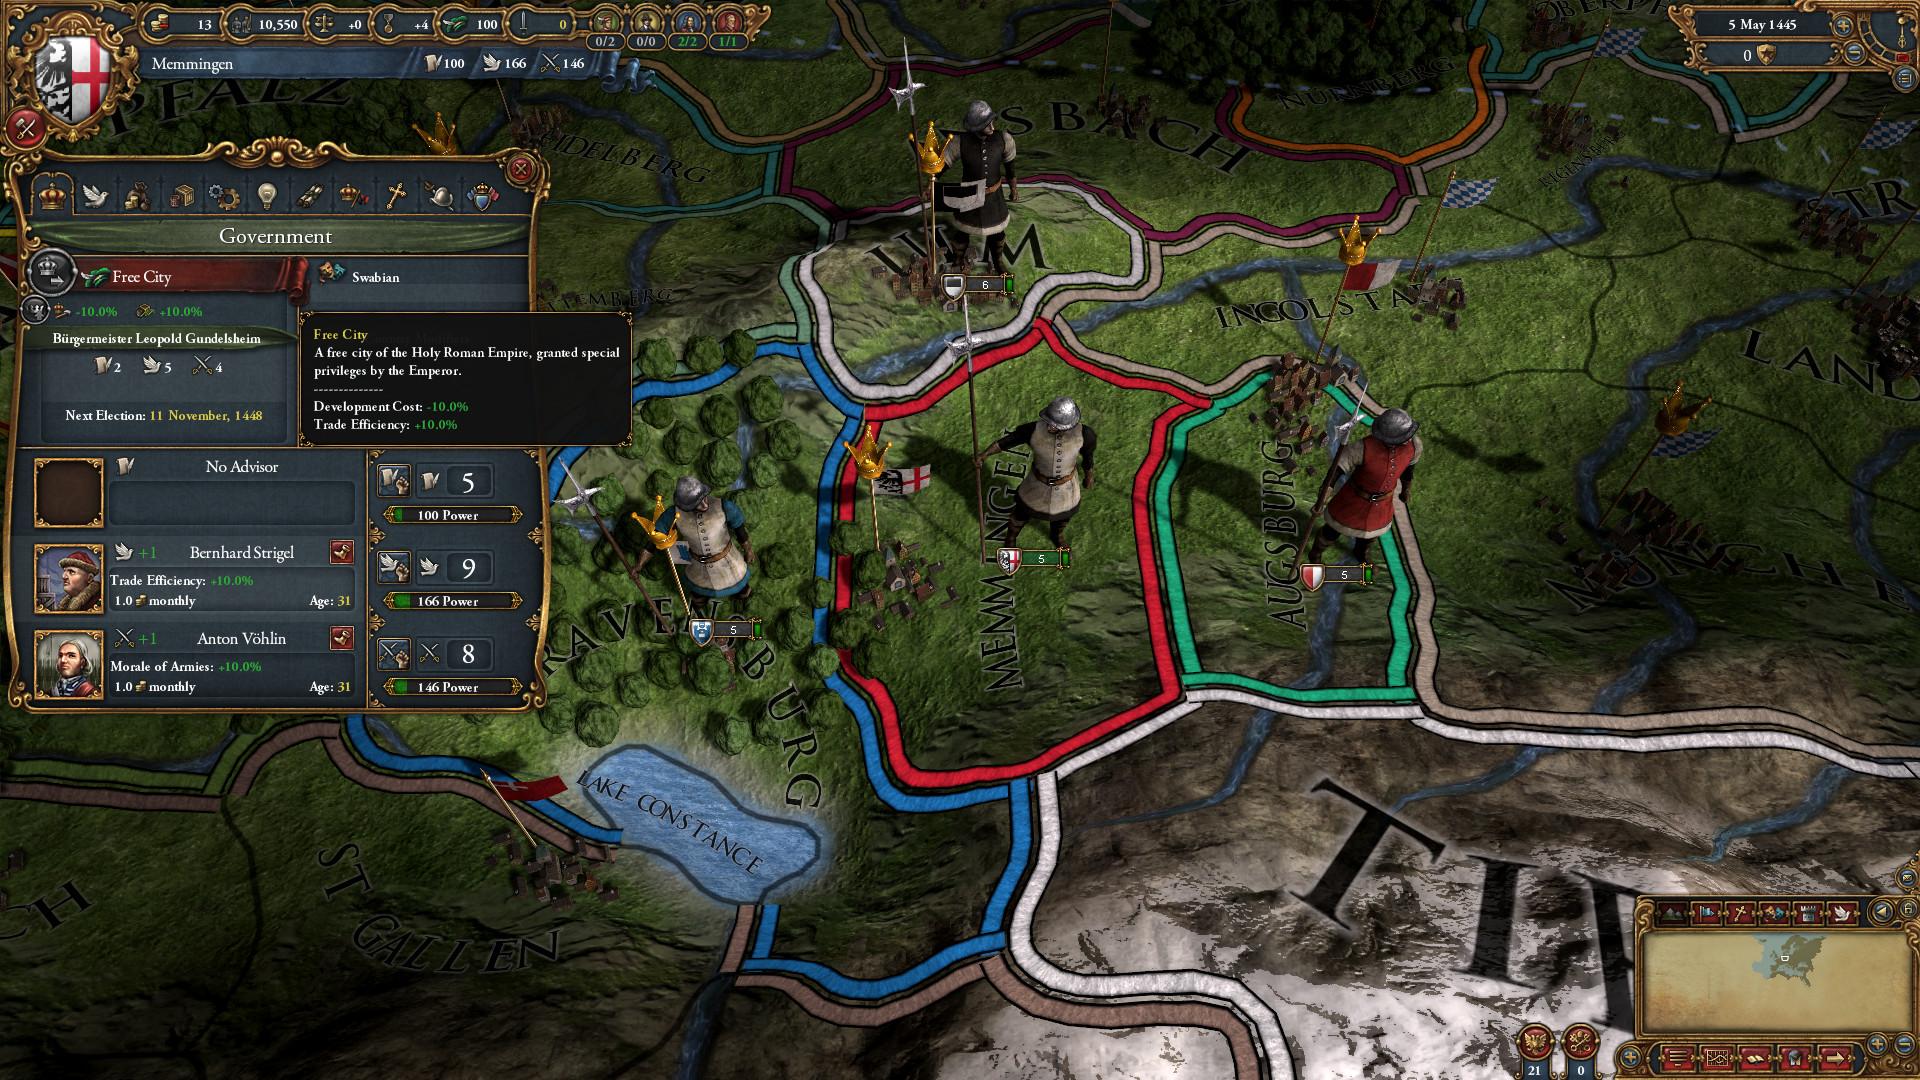 Serial Key Europa Universalis 4 Mods - sevenmore